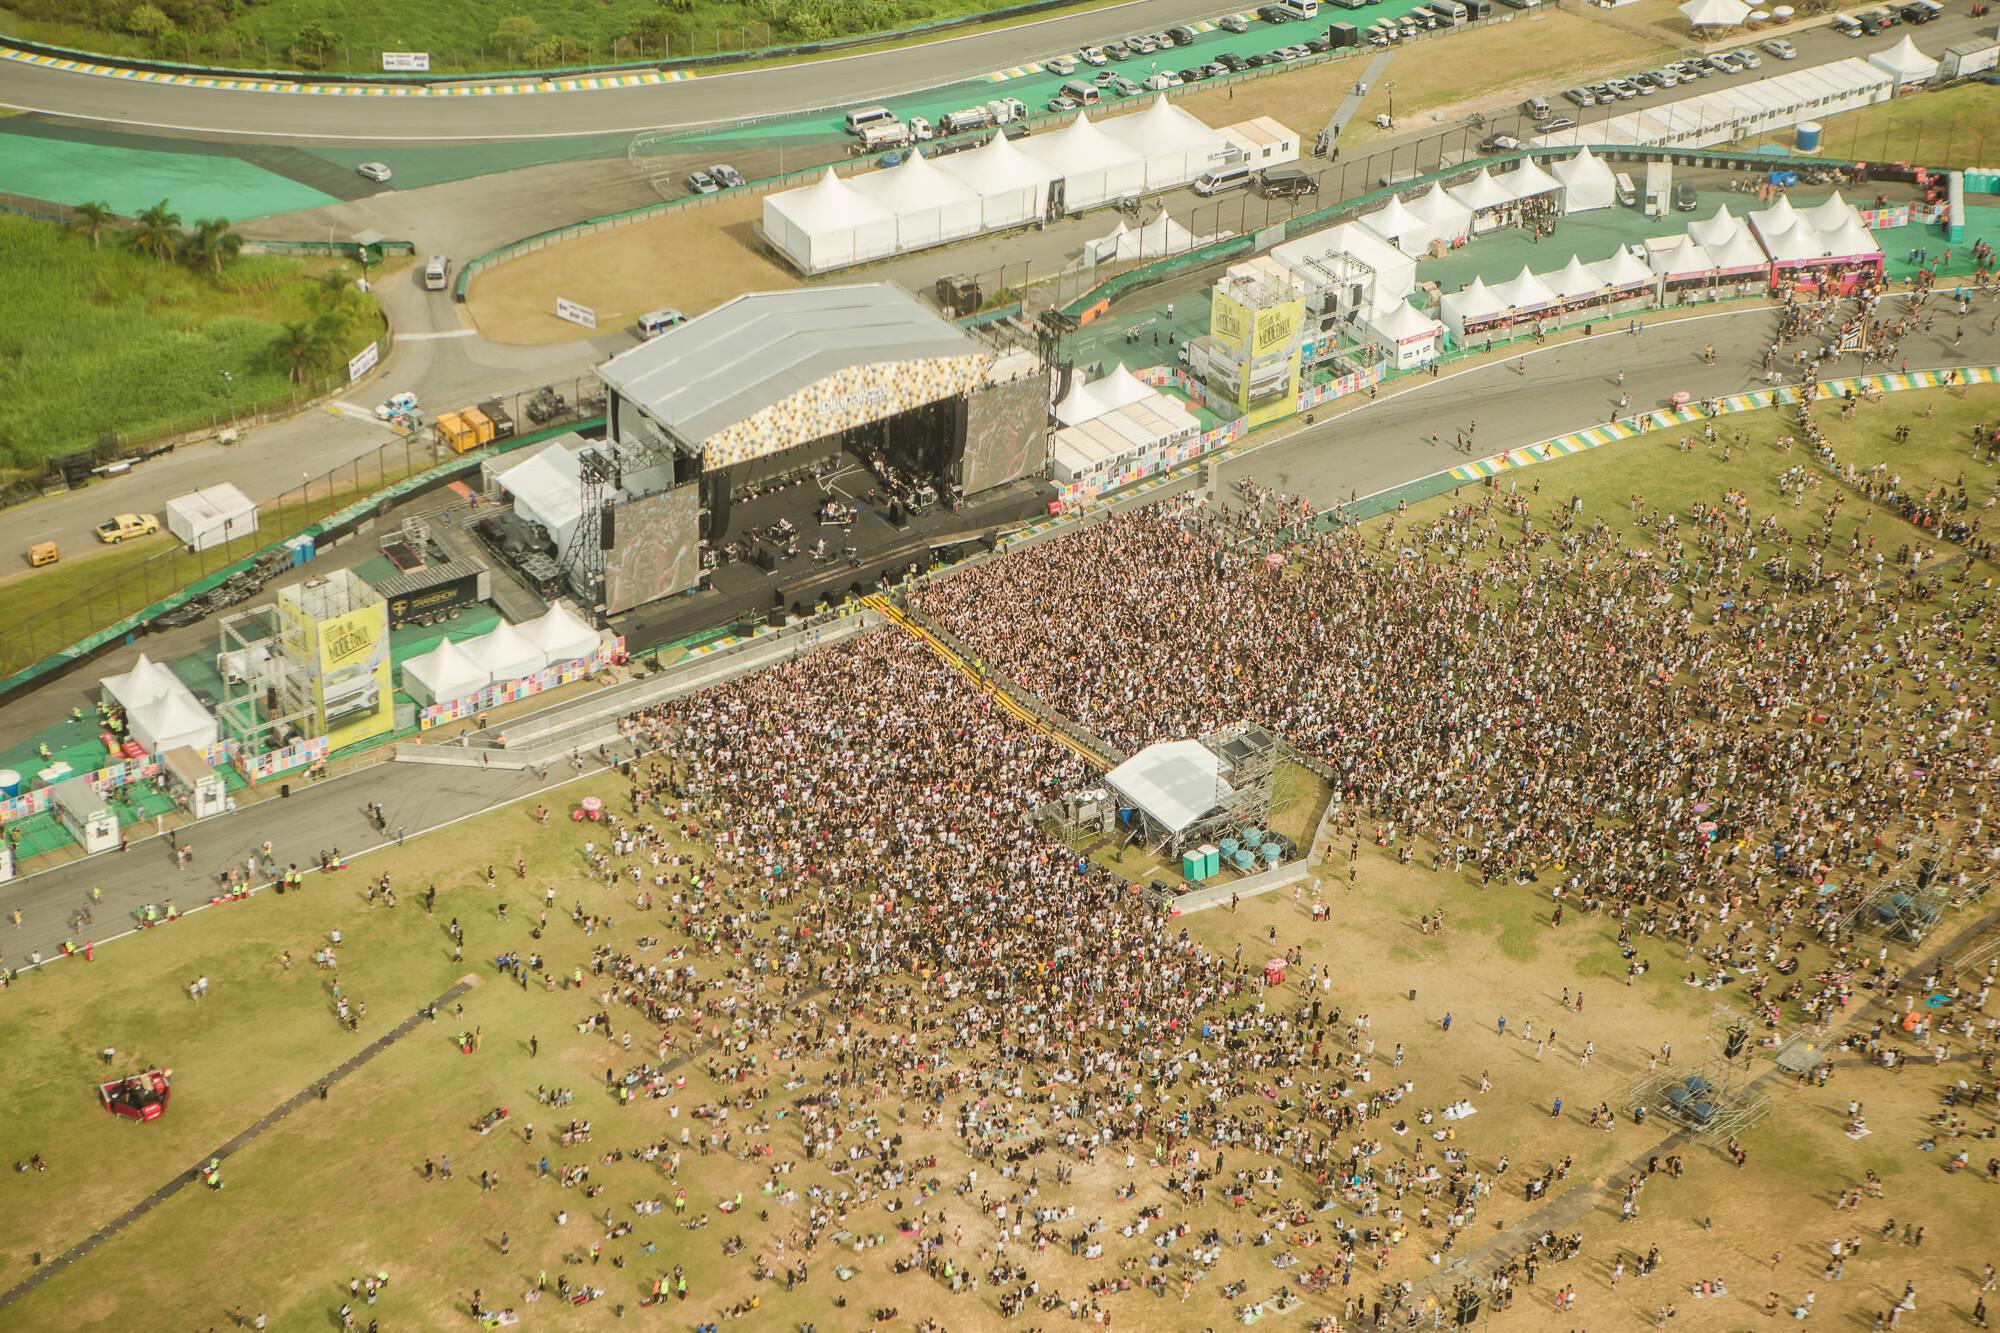 Lollapalooza 2019. Foto: Divulgação/Lollapalooza